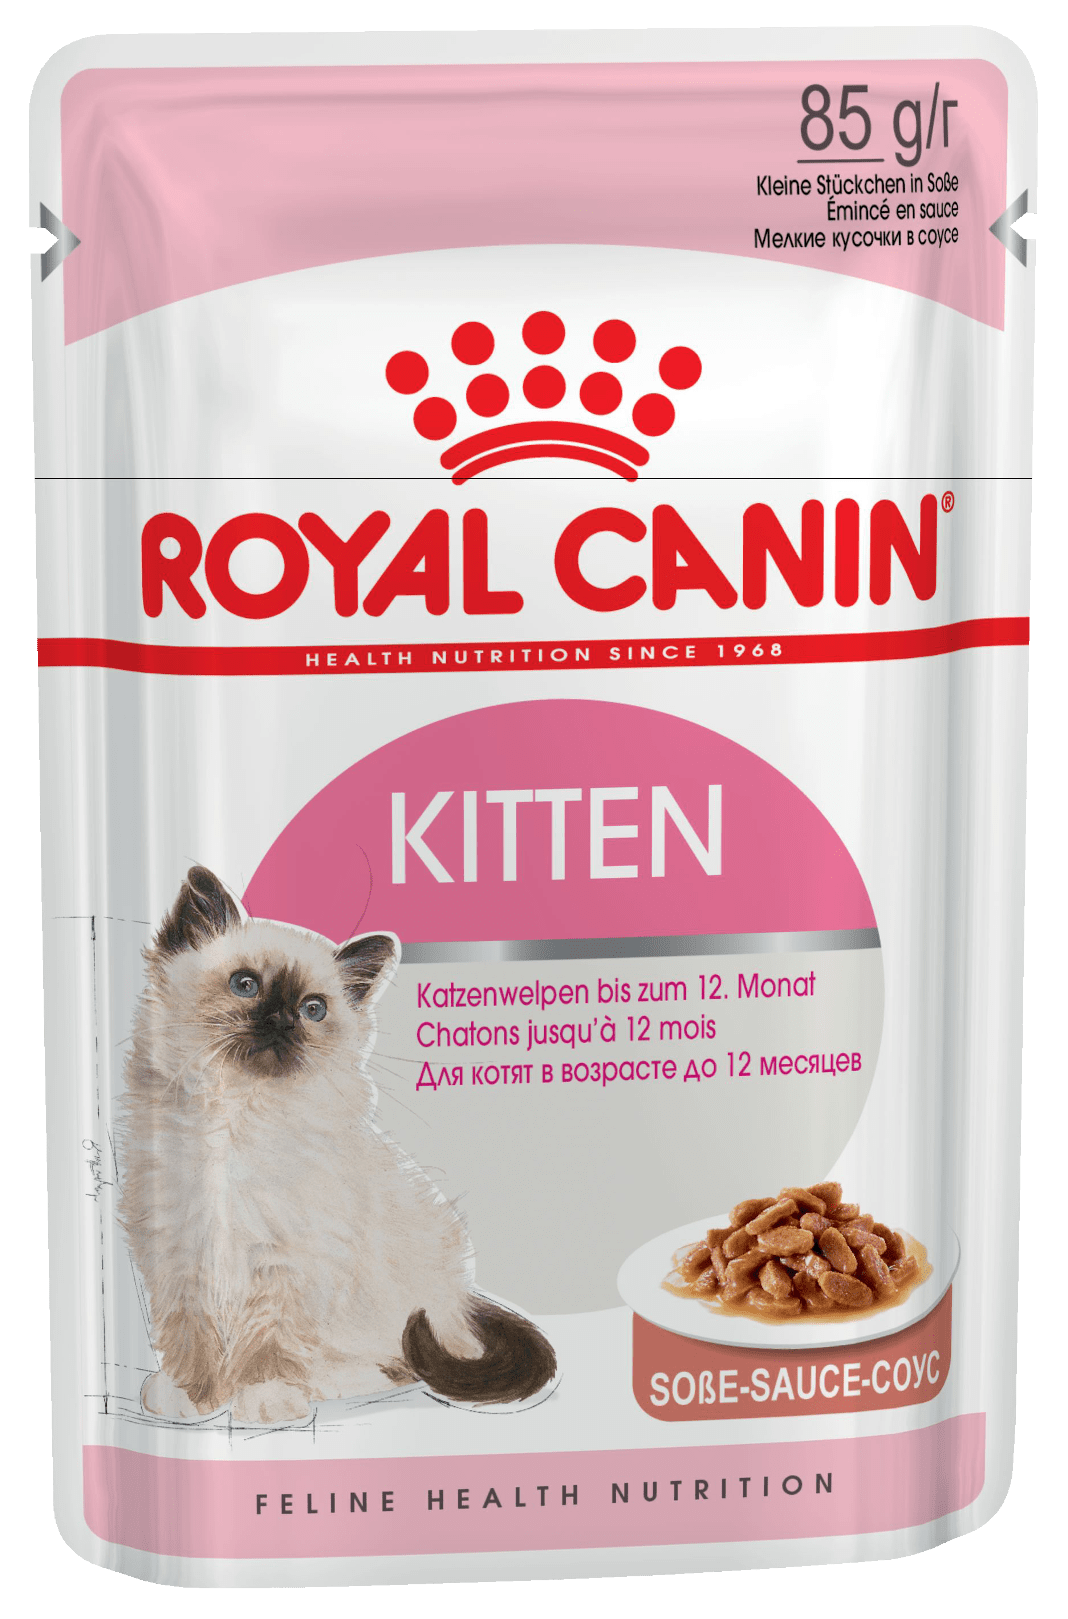 Royal Canin Пауч для котят с 4 до 12 месяцев, Royal Canin Kitten Instinctive (в соусе) d_kitten_in_gravy.png